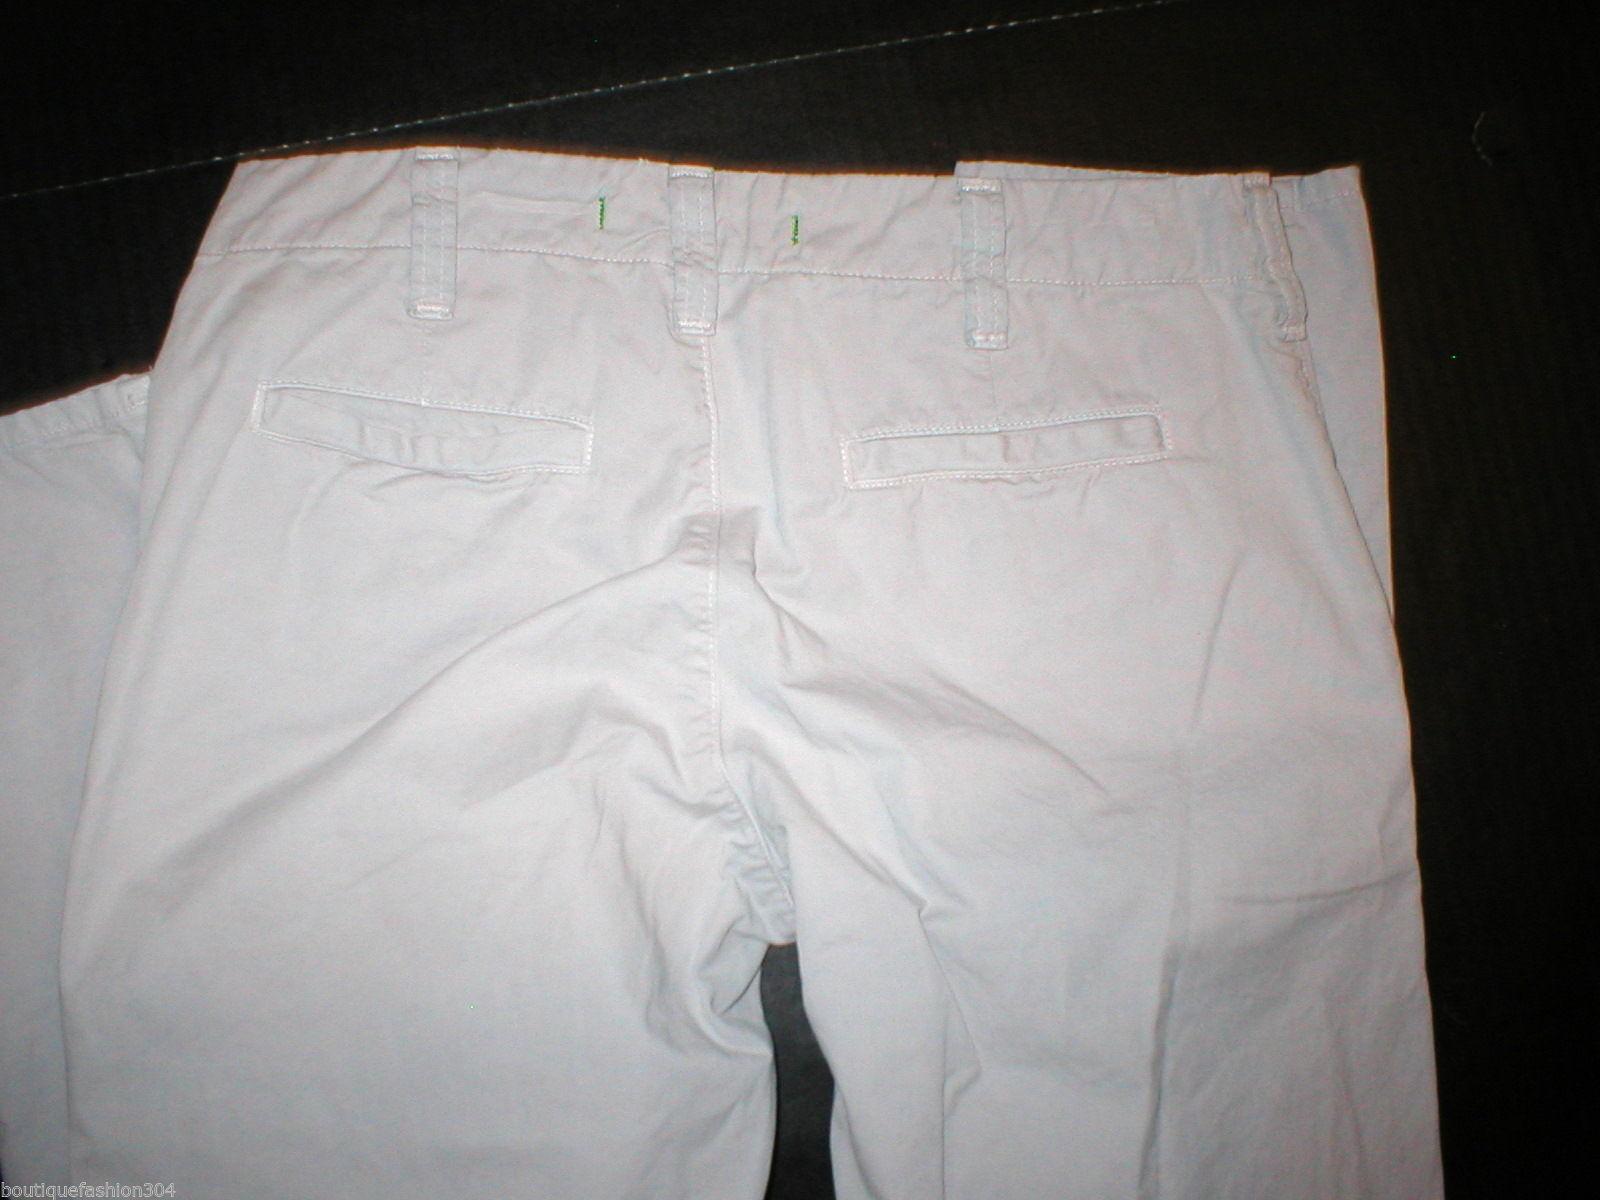 New J Brand Jeans Pants Khaki 25 28 X 27 Crop Womens Skinny Capri Khakis Twill image 3